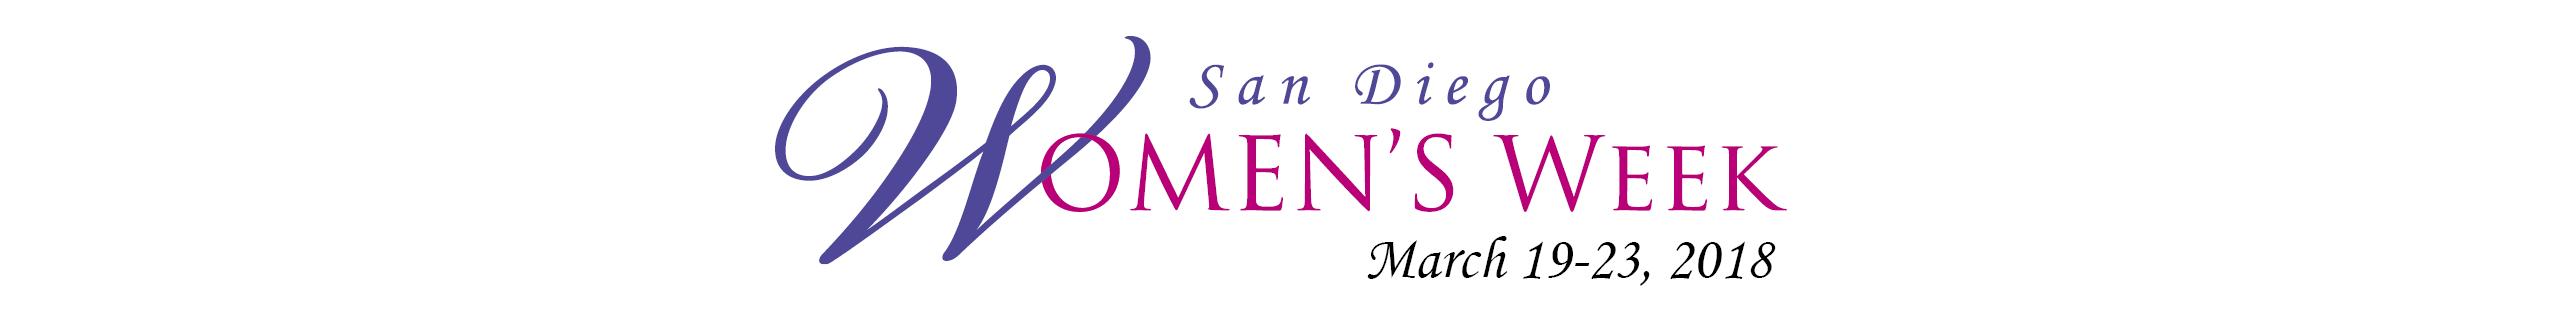 San Diego Women's Week Logo